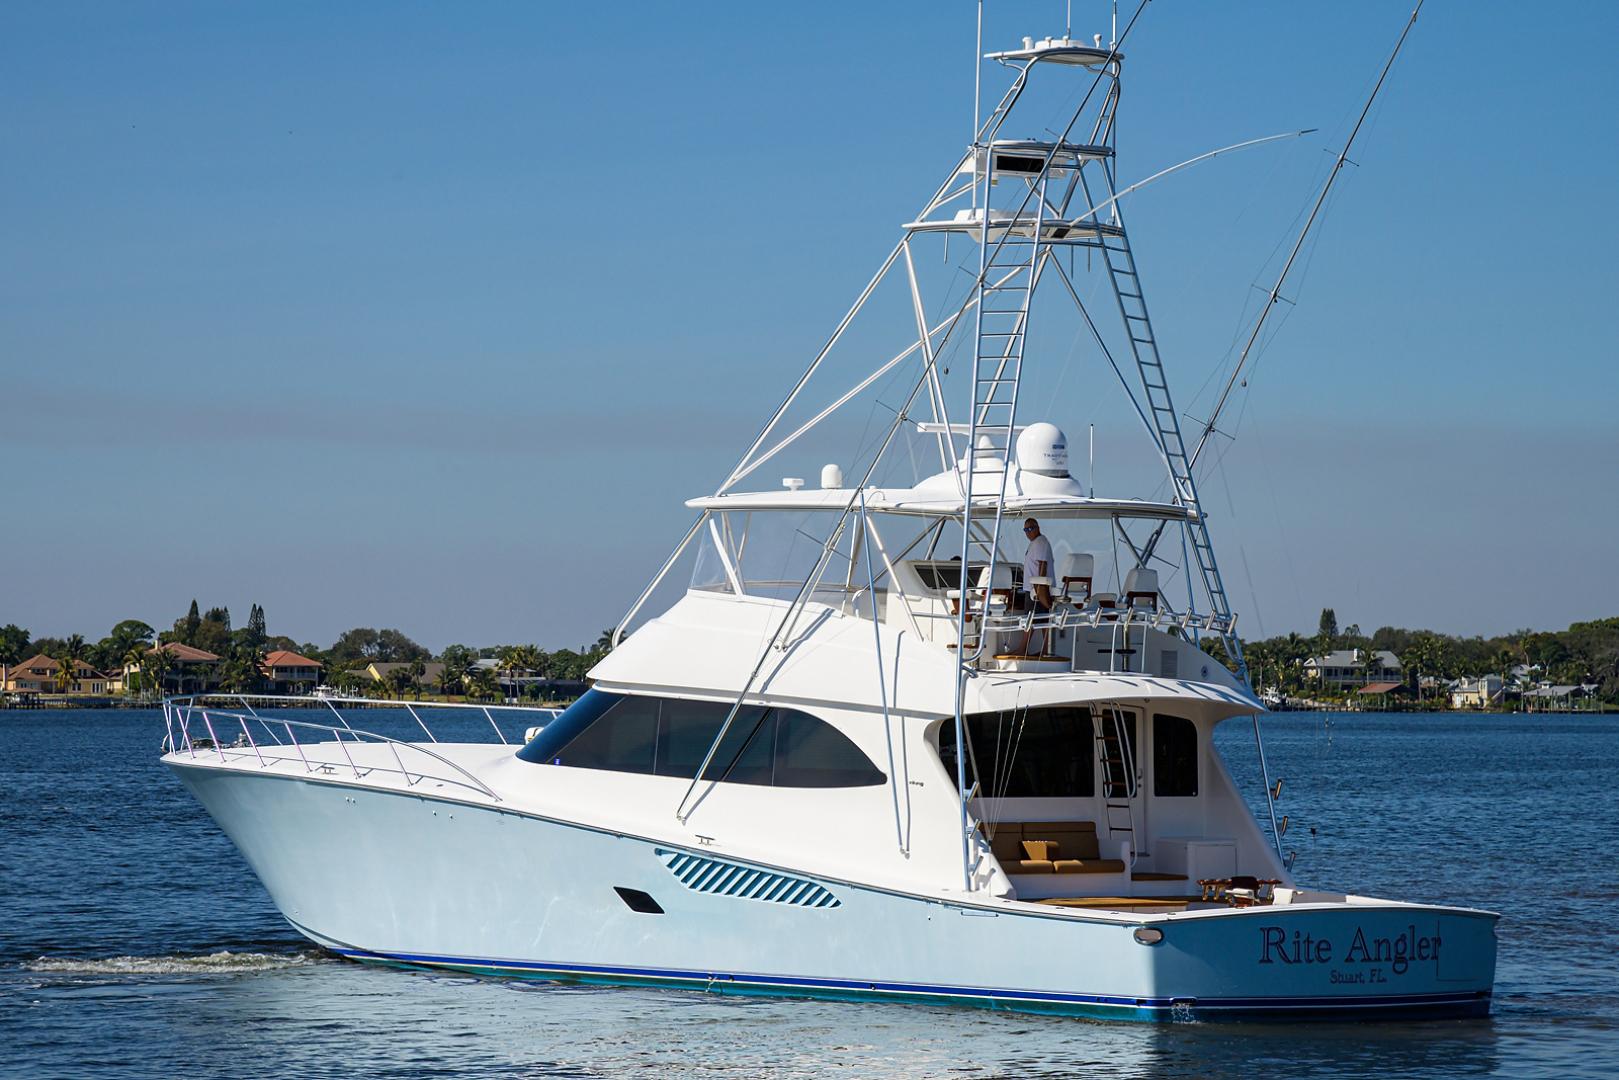 Viking-Convertible  2010-RITE ANGLER Stuart-Florida-United States-RITE ANGLER-1601795 | Thumbnail